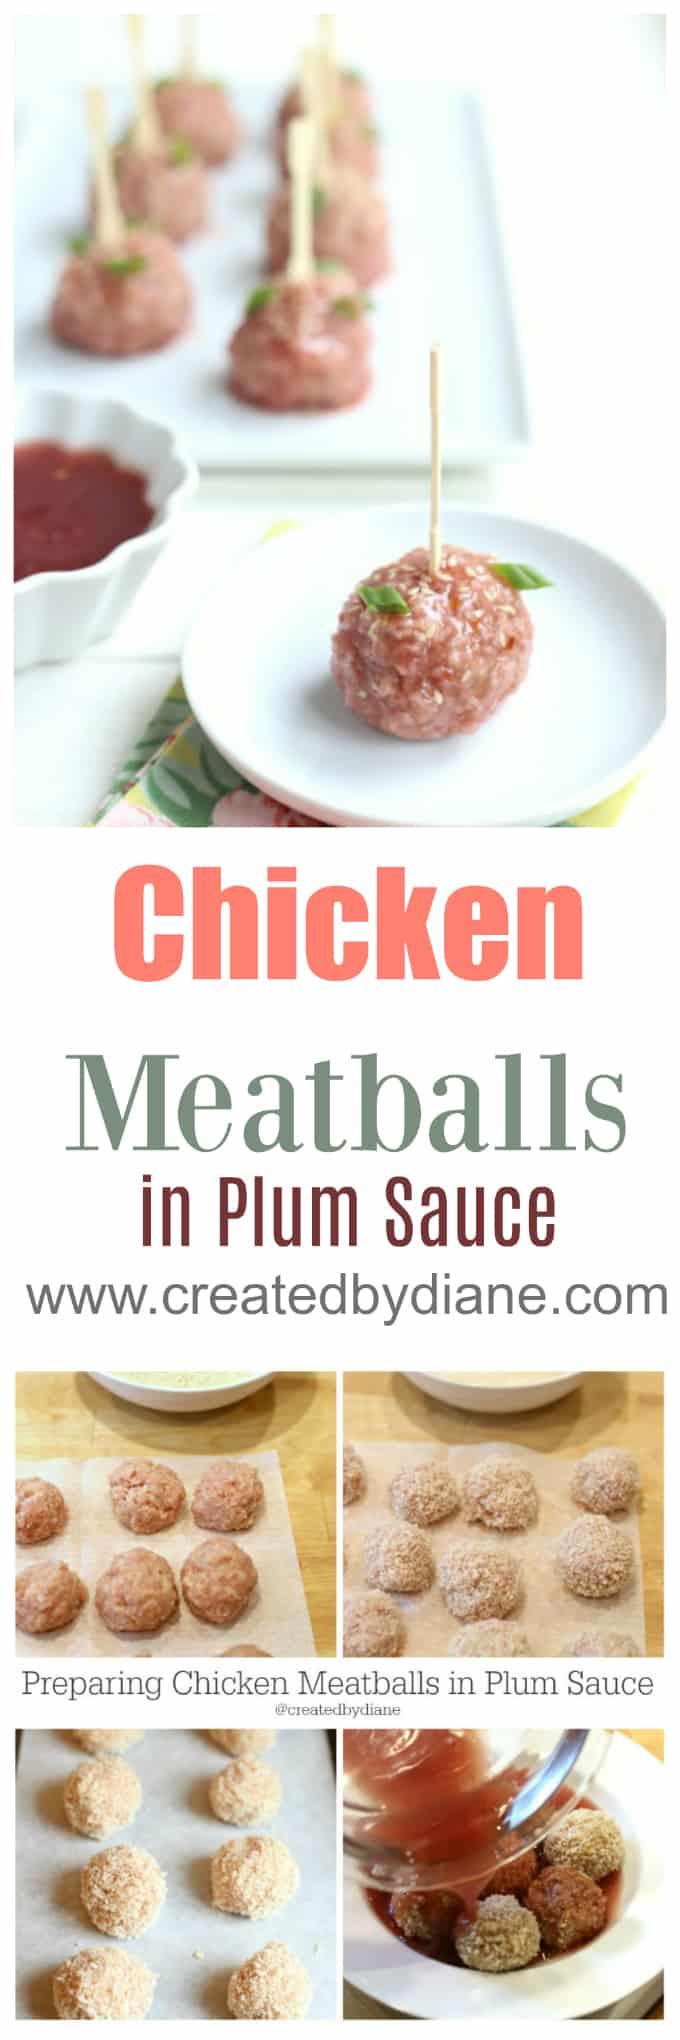 chicken meatballs in plum sauce www.createdbydiane.com